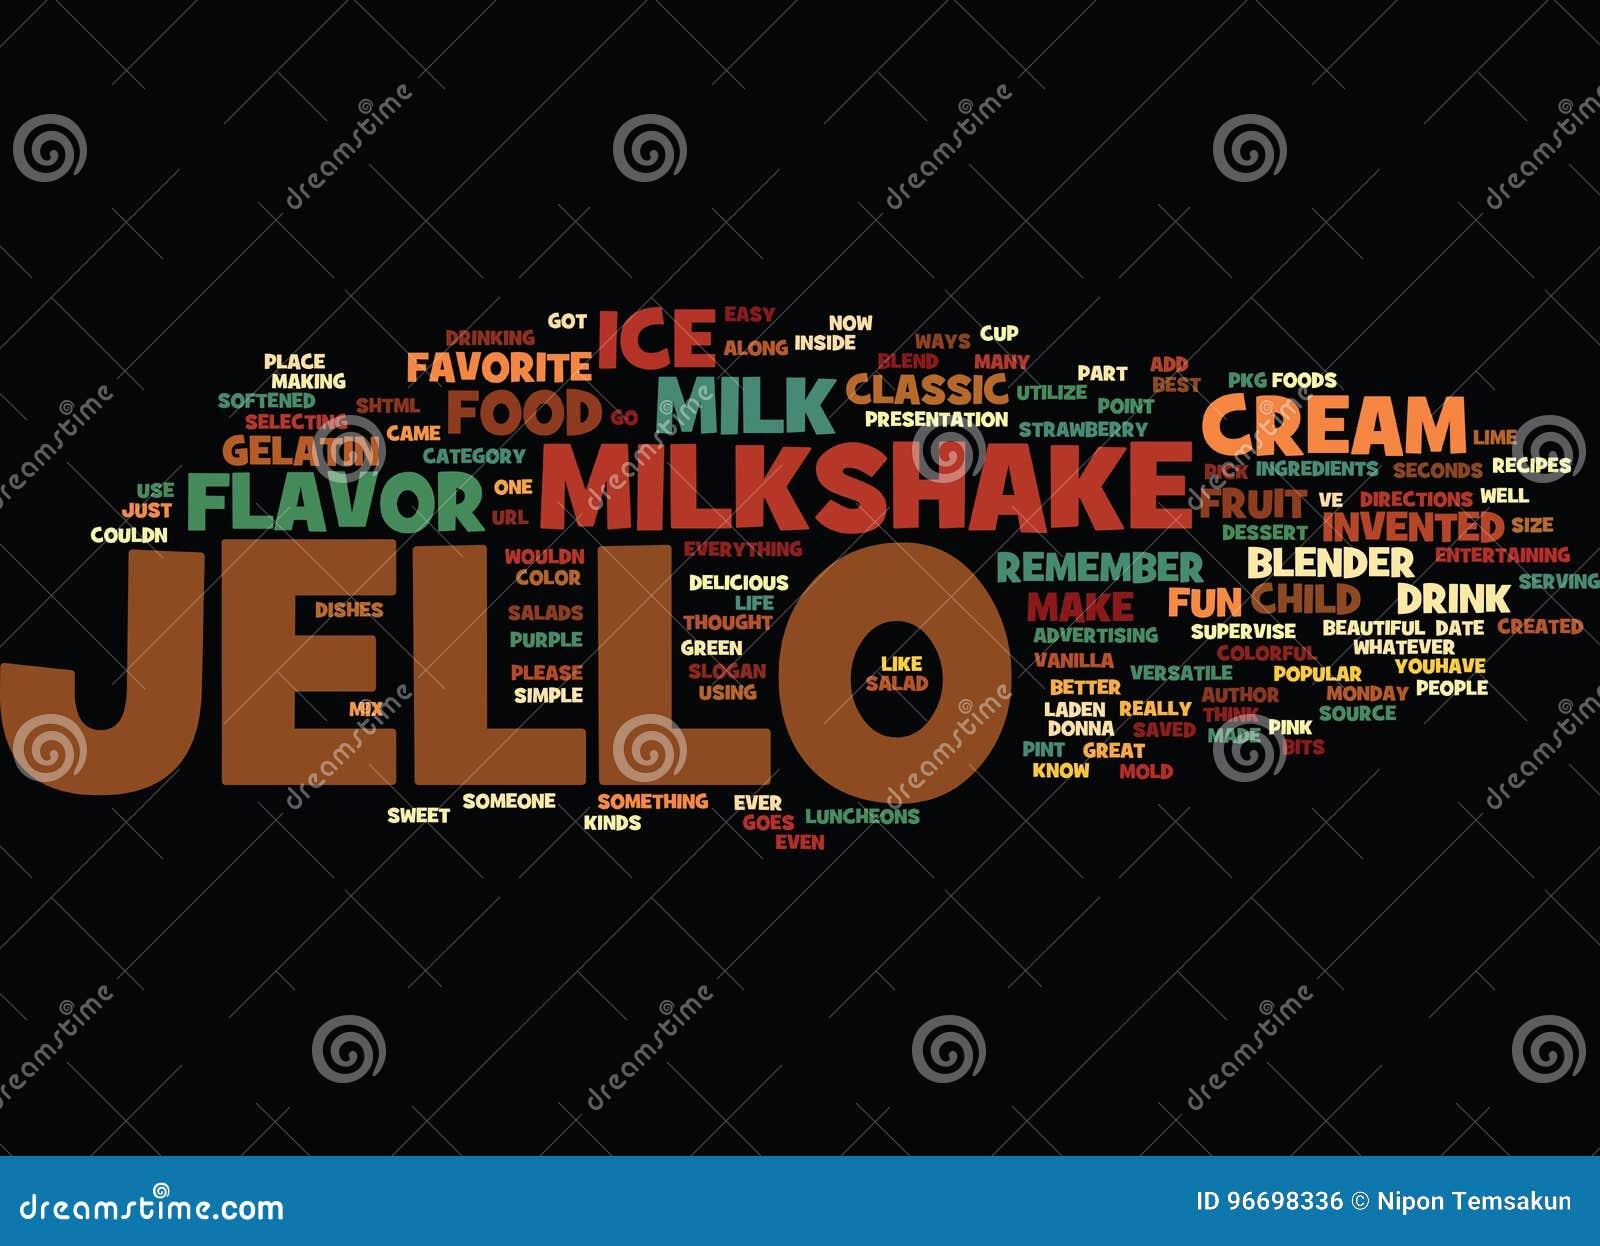 Best Recipes Classic Jello Milkshake Word Cloud Concept Stock